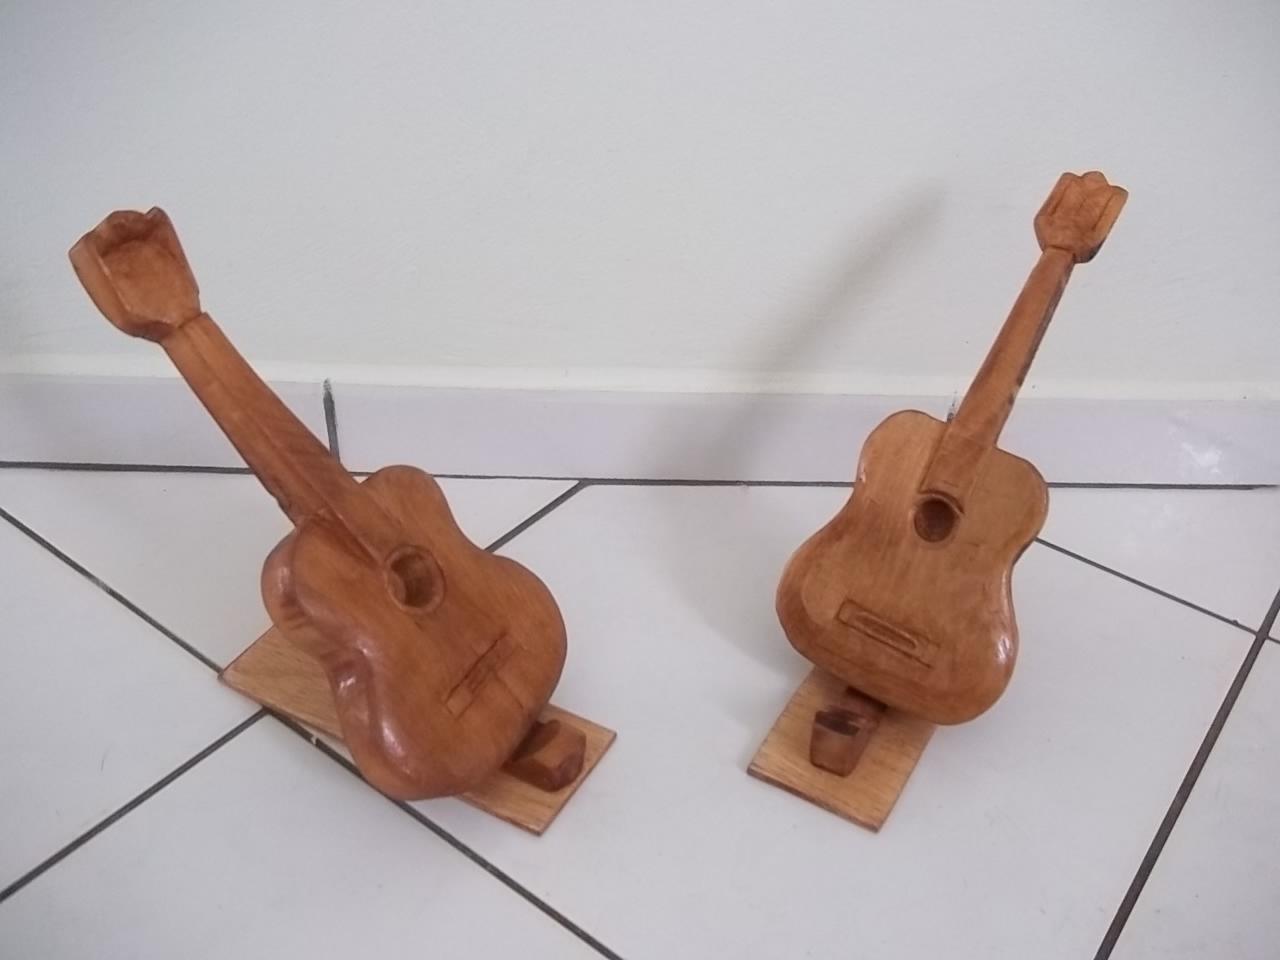 Artesanato em madeira maciça